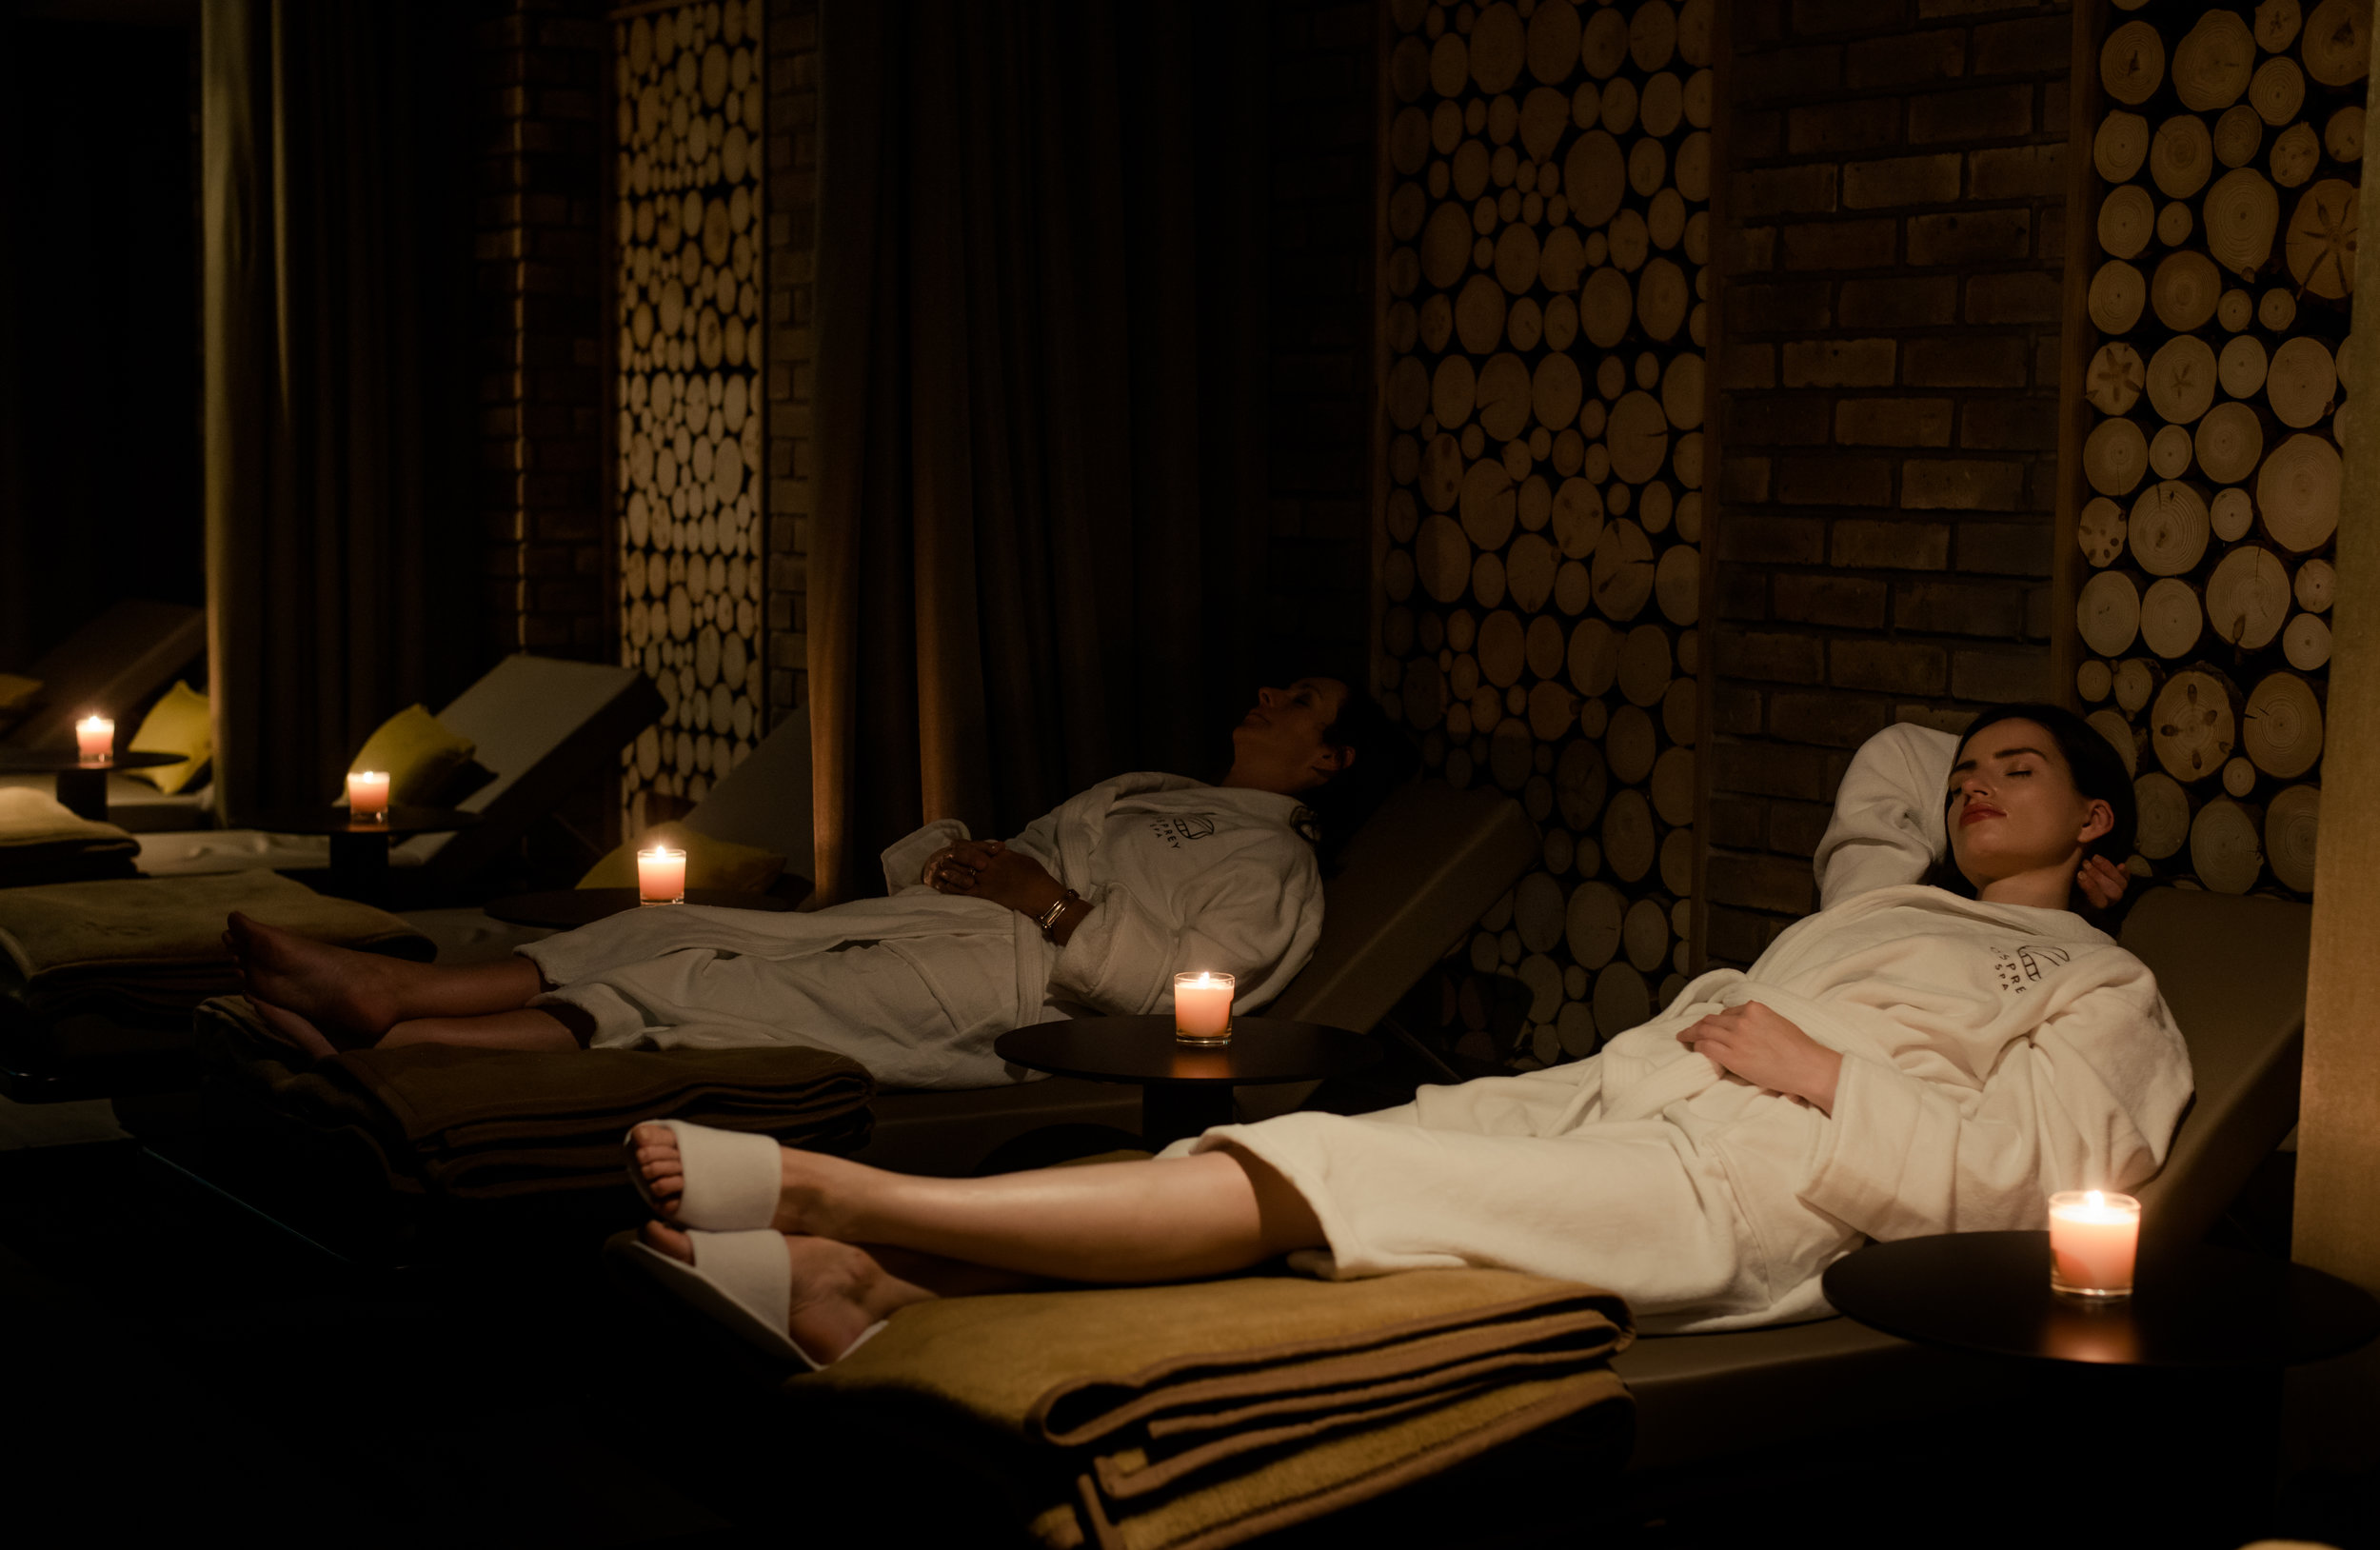 Osprey Spa Dark Relaxation Room Ladies Closeup.jpg